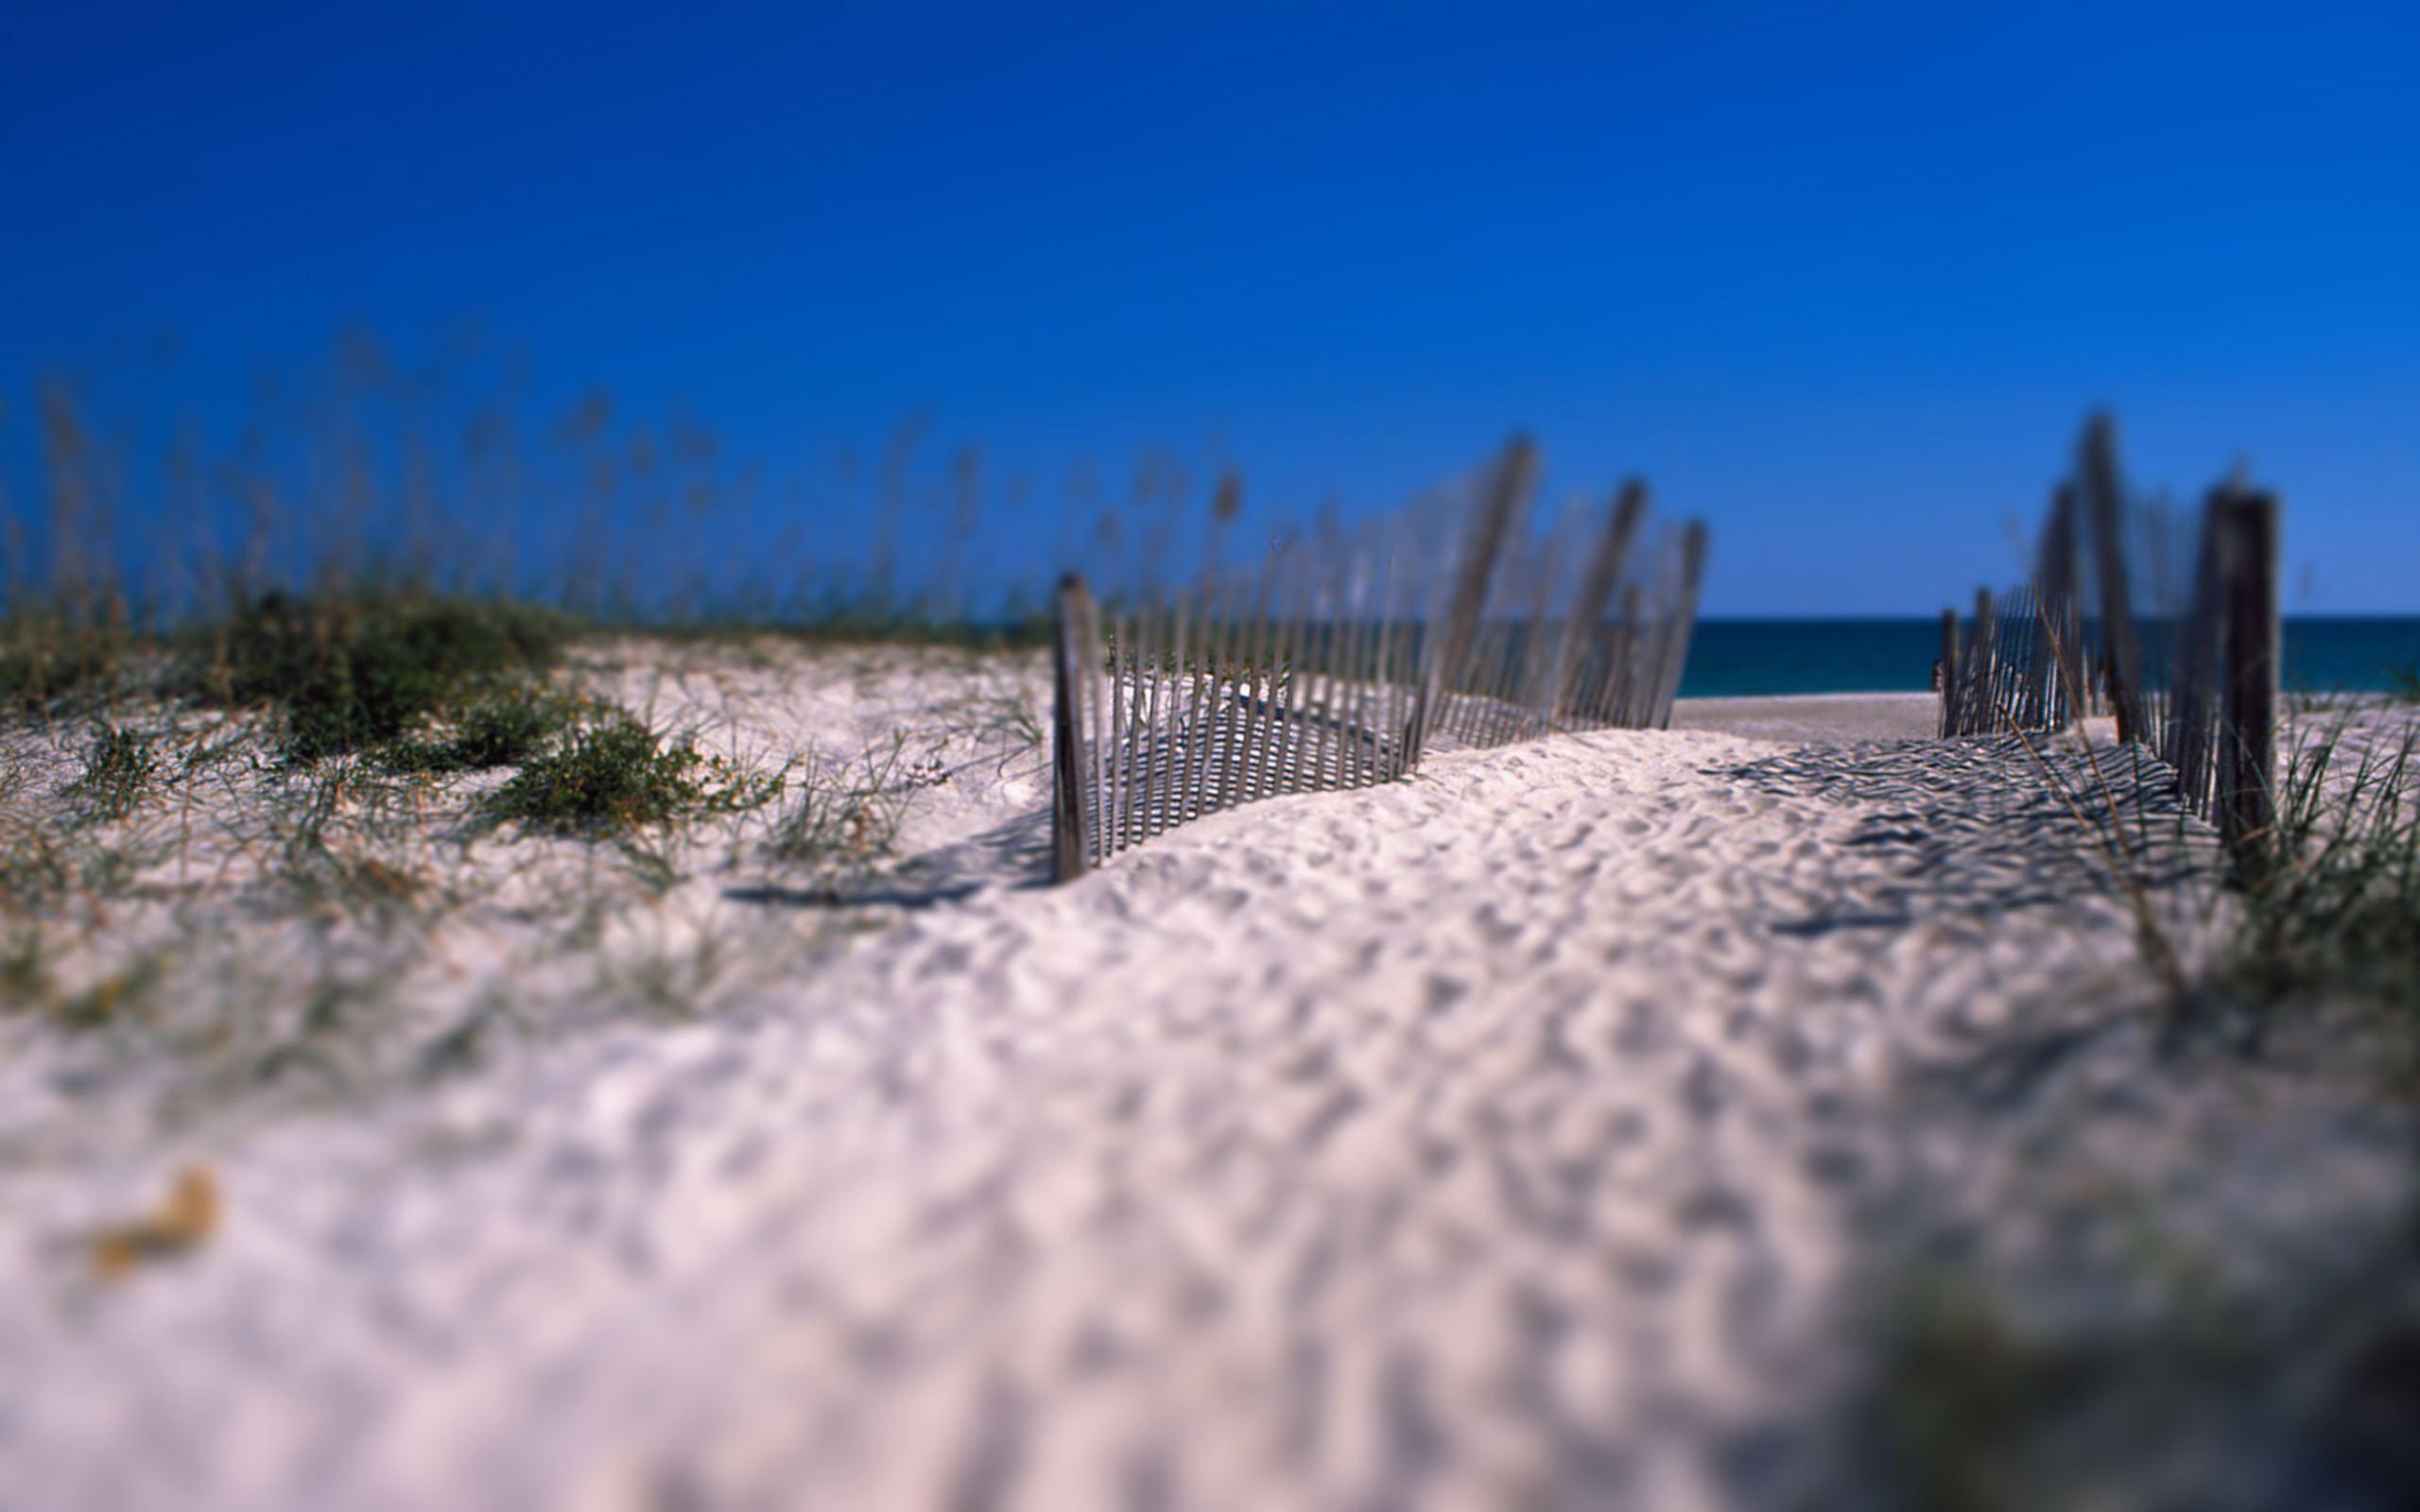 Arena en la playa - 2560x1600